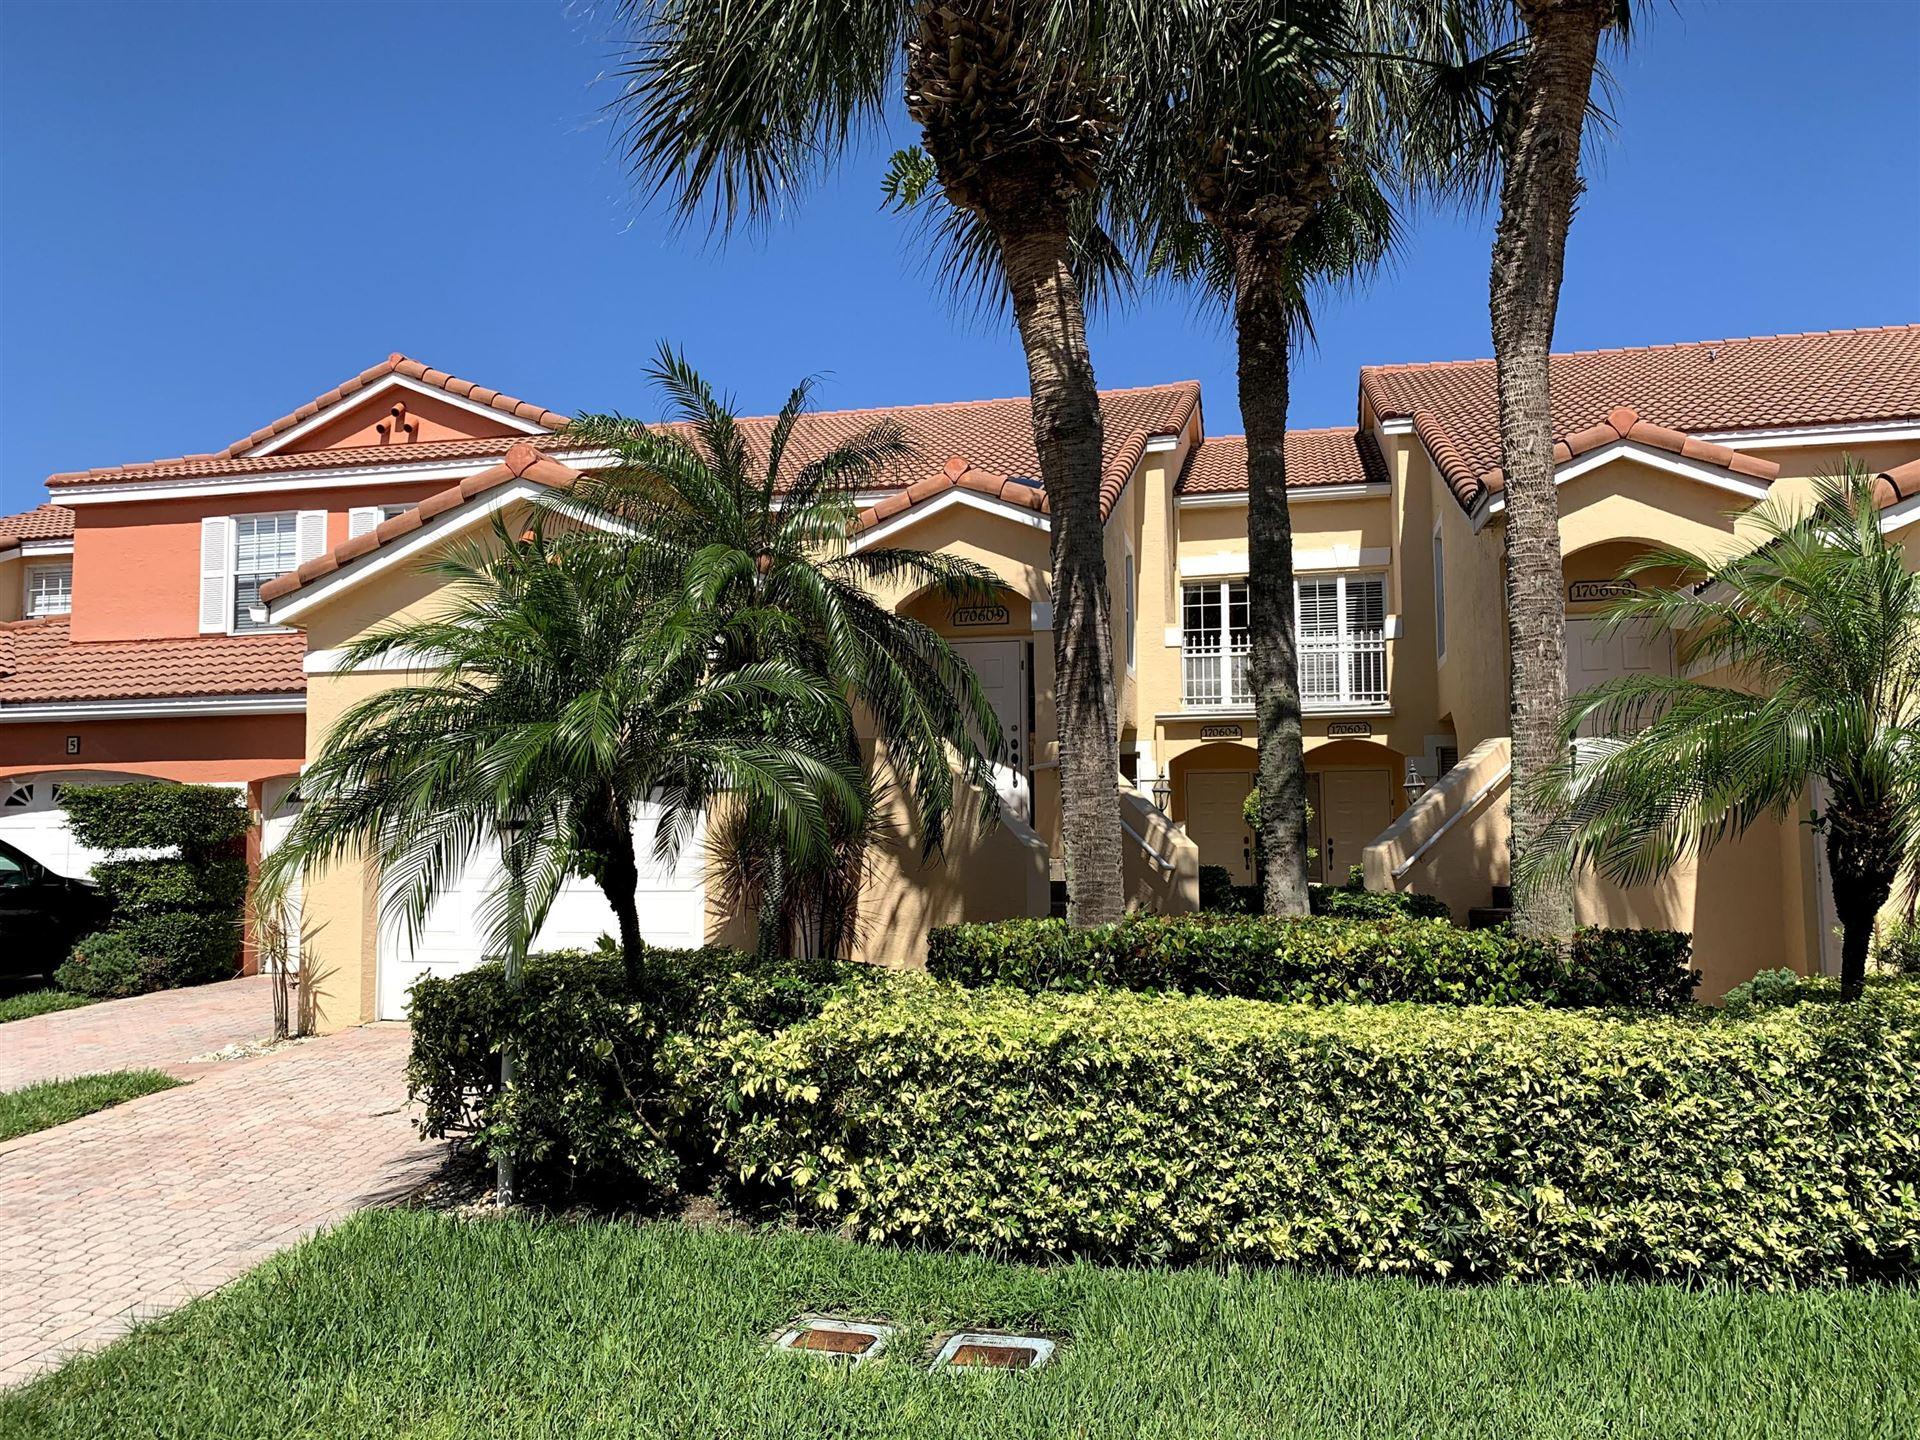 17060 Emile Street #9, Boca Raton, FL 33487 - #: RX-10639881